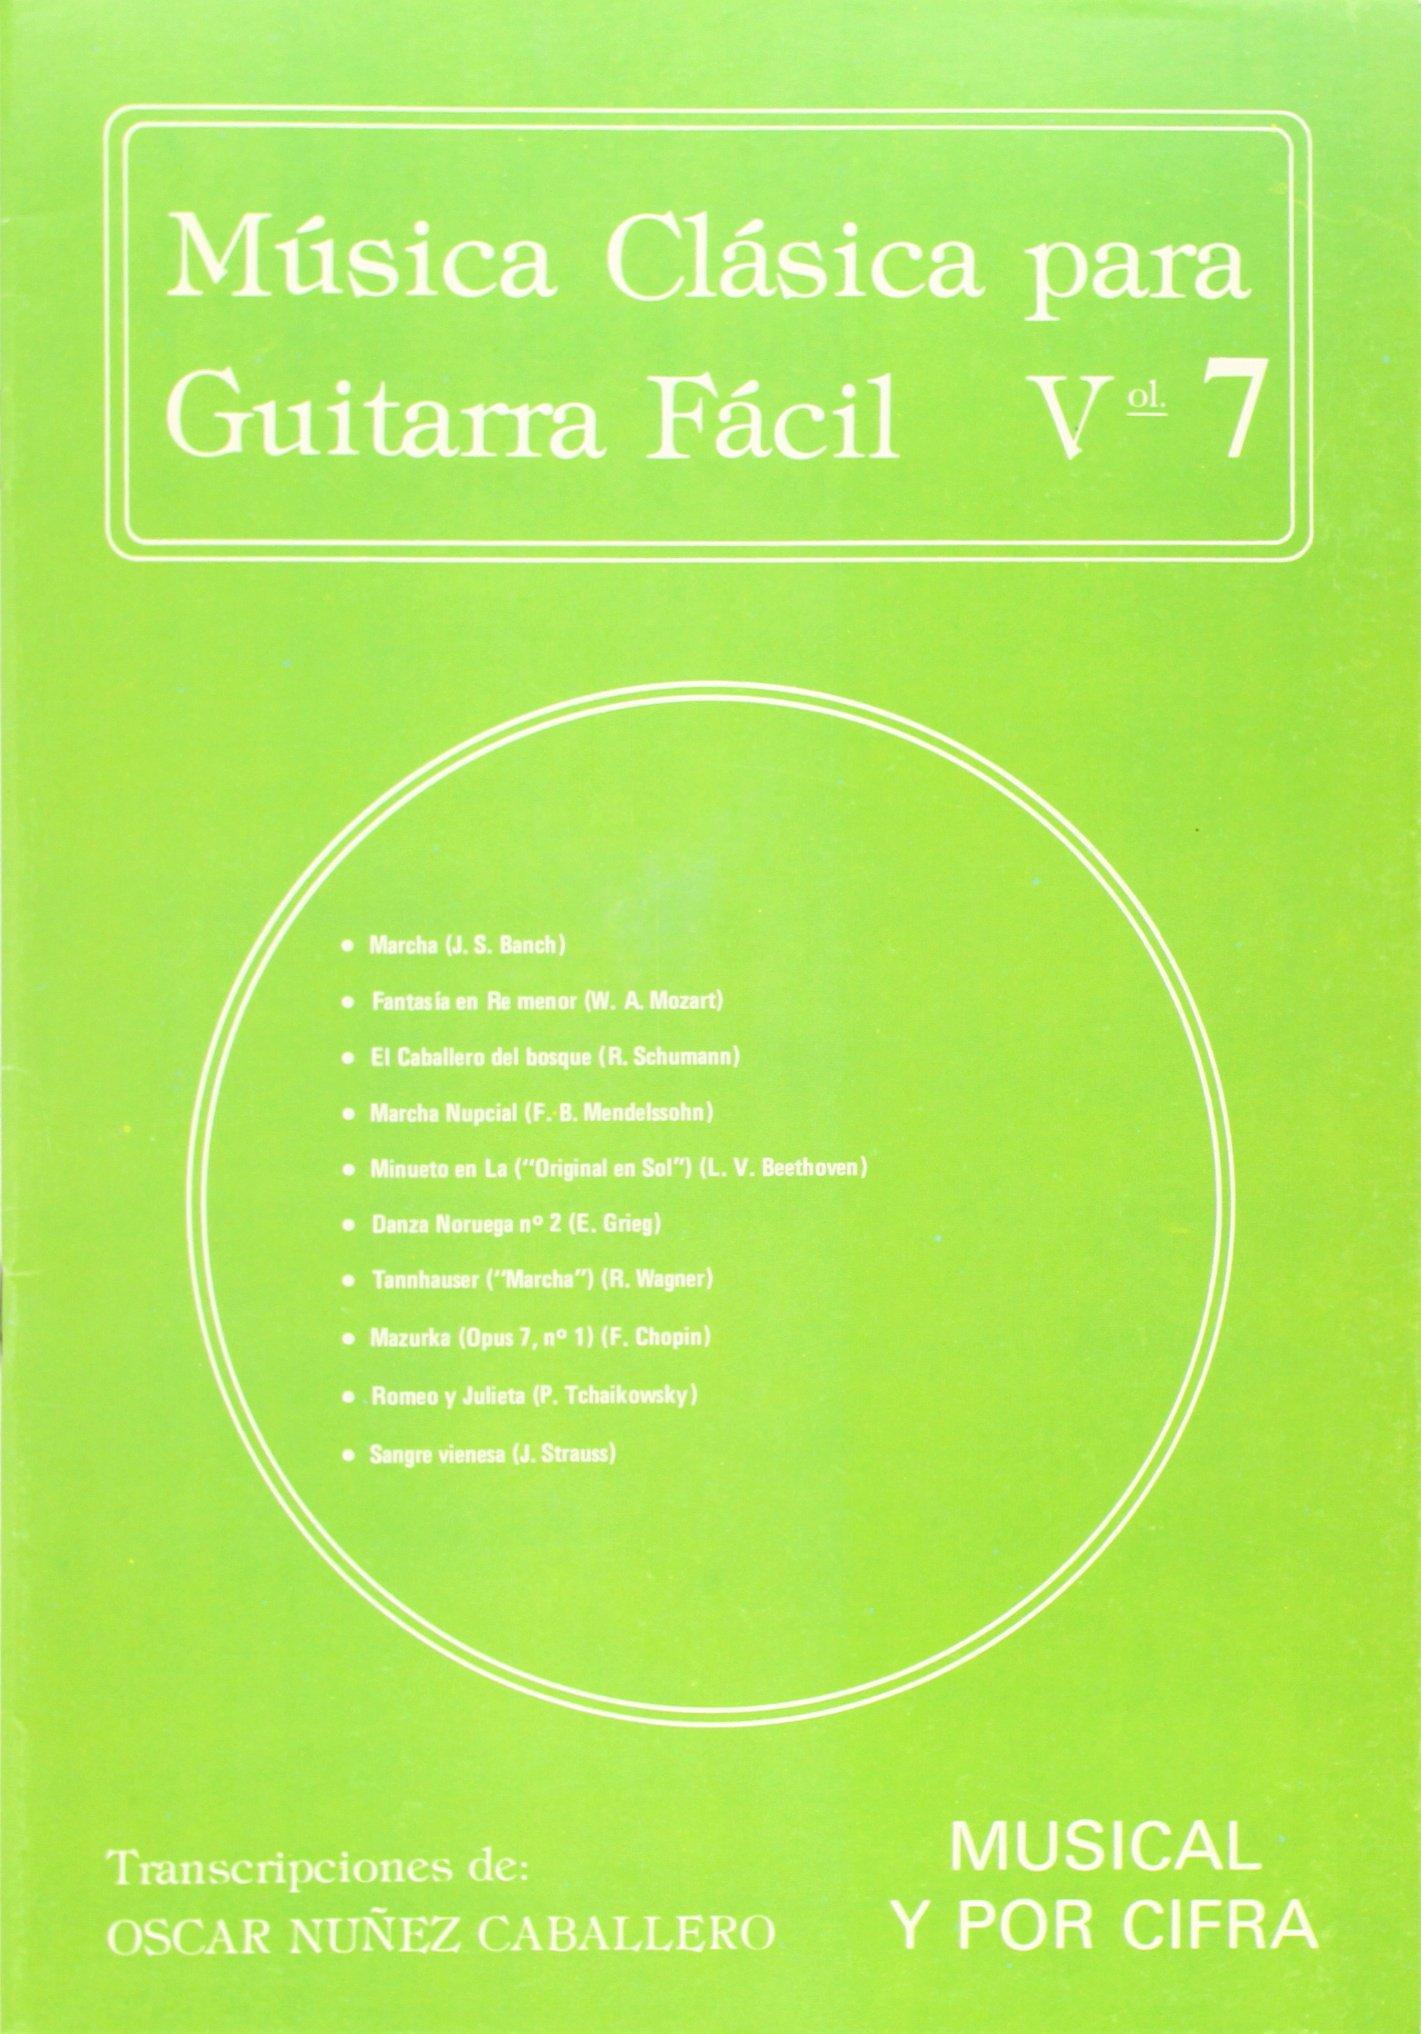 Música Clásica para Guitarra Fácil, Volumen 7: Amazon.es: Aa.Vv ...